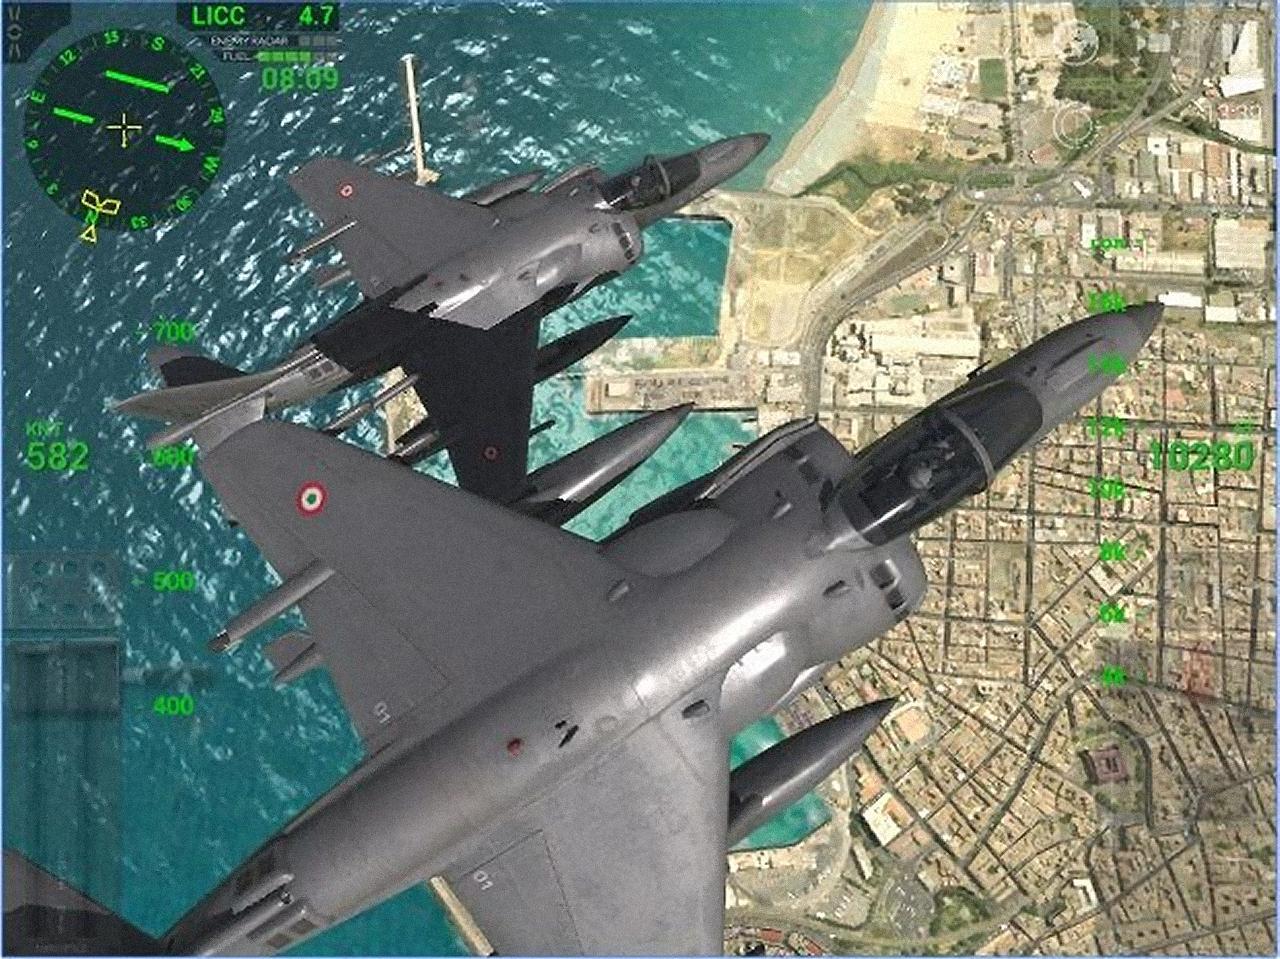 Marina Militare - Italian Navy Sim Android iOS PC immagine 12